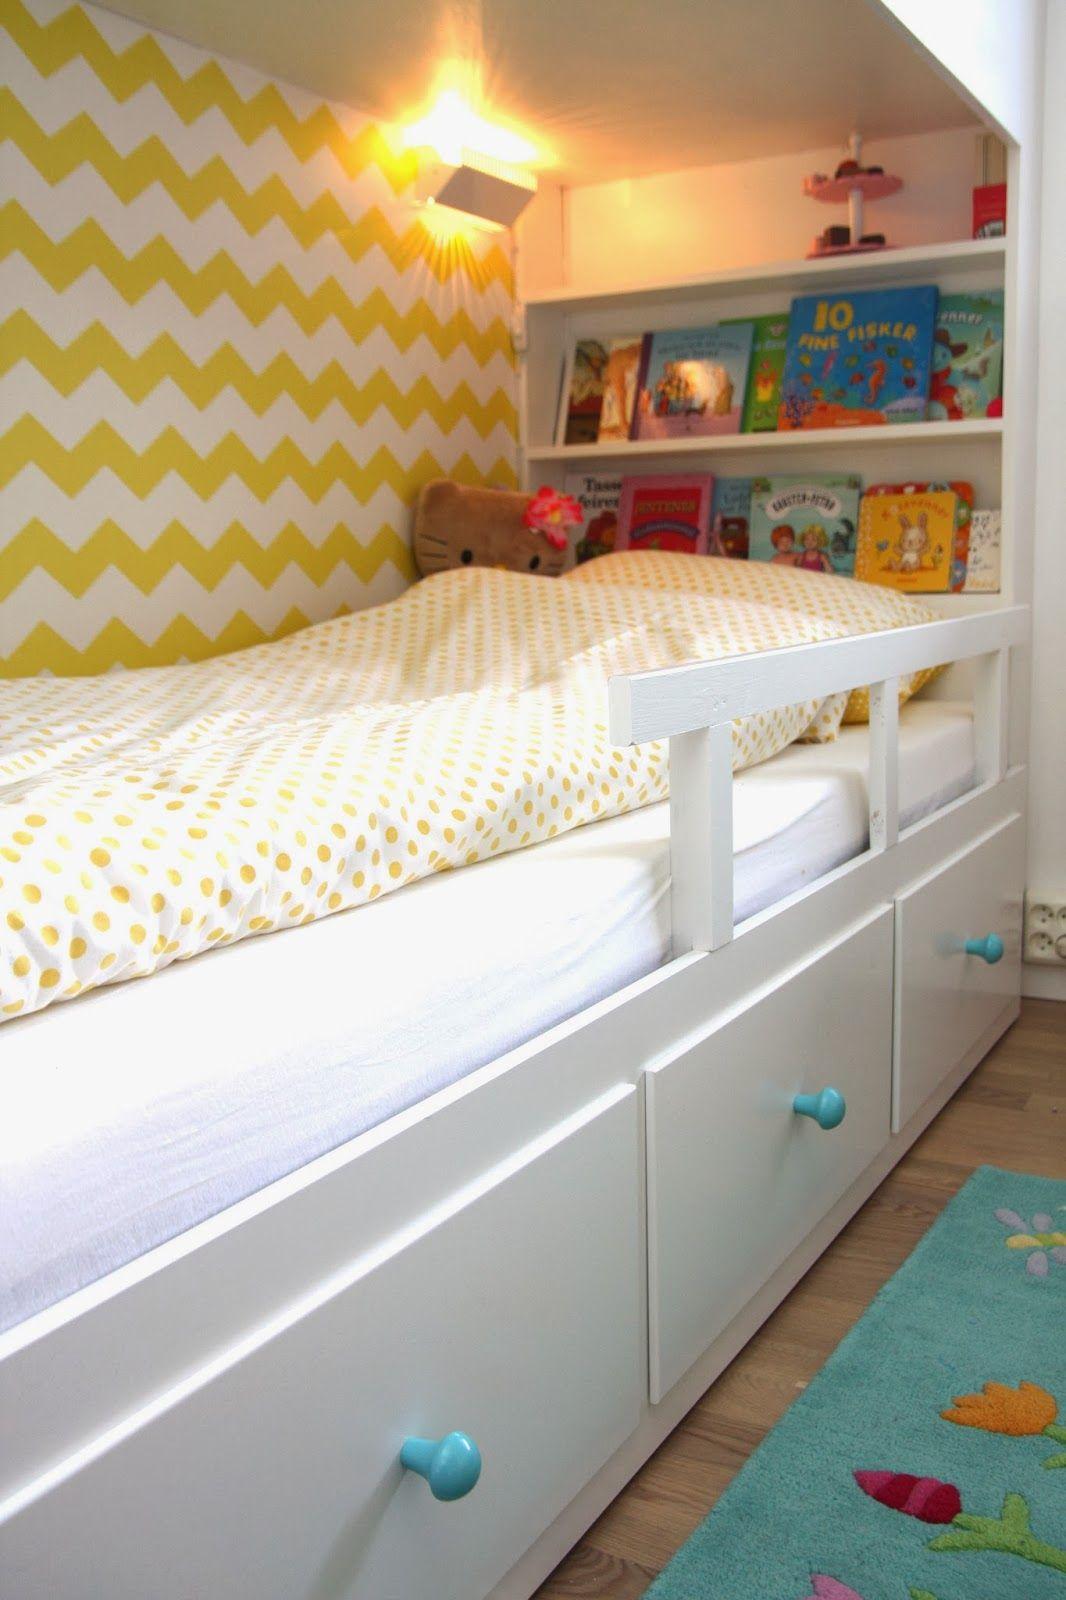 Ikea Hemnes Bedbank.Plassbygd Seng Til Jenterommet Kinder Zimmer Ikea Hemnes Bett